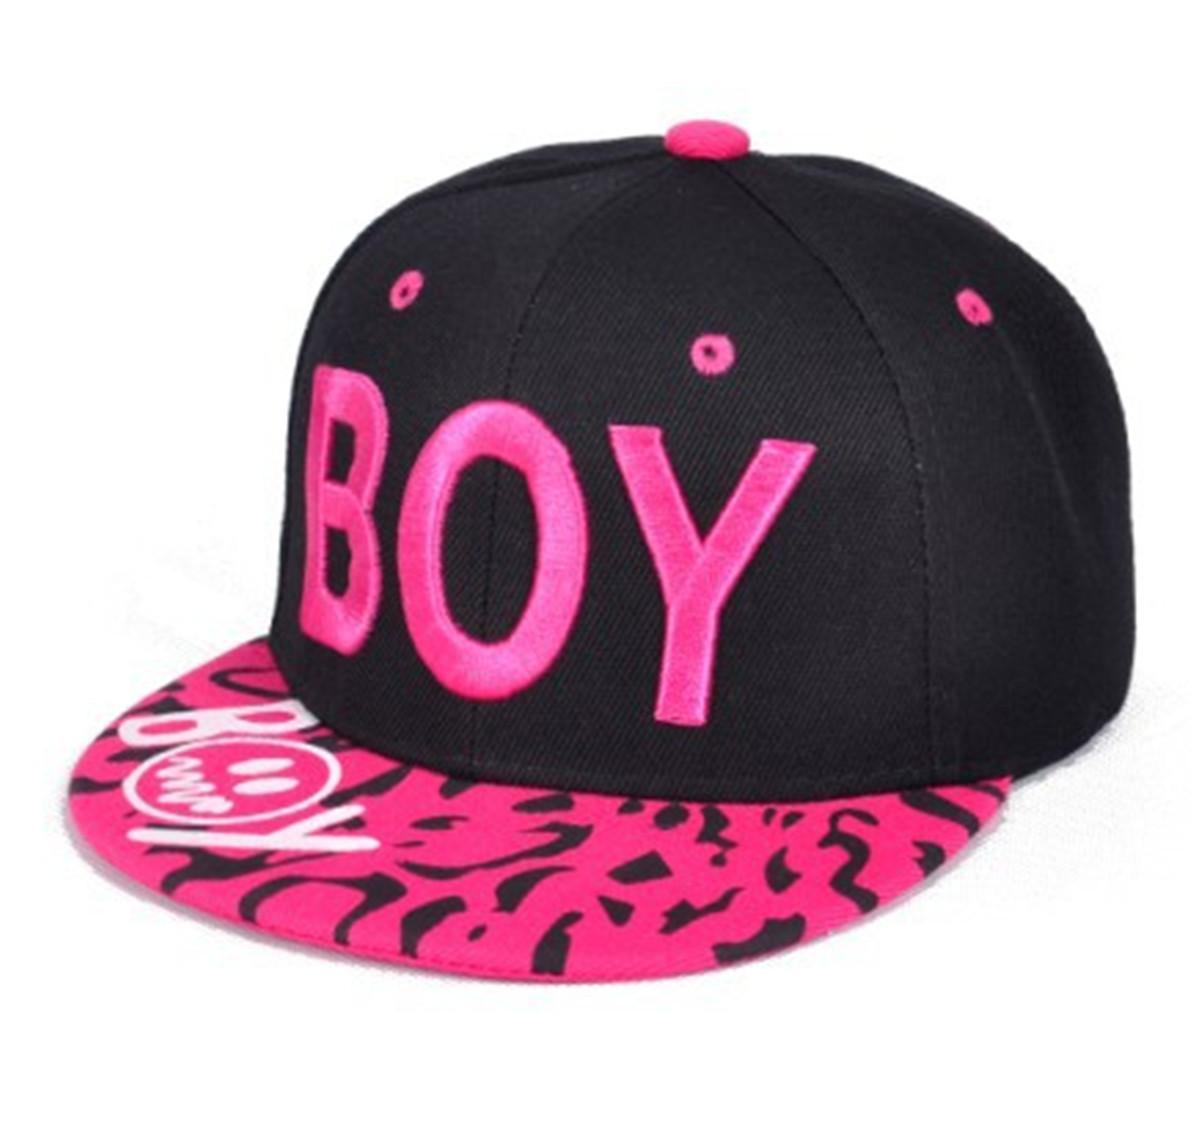 9b2b5cd3614 Kid Children Embroidered Sport Hip-hop Baseball Cap Sun Snapback Hat ...